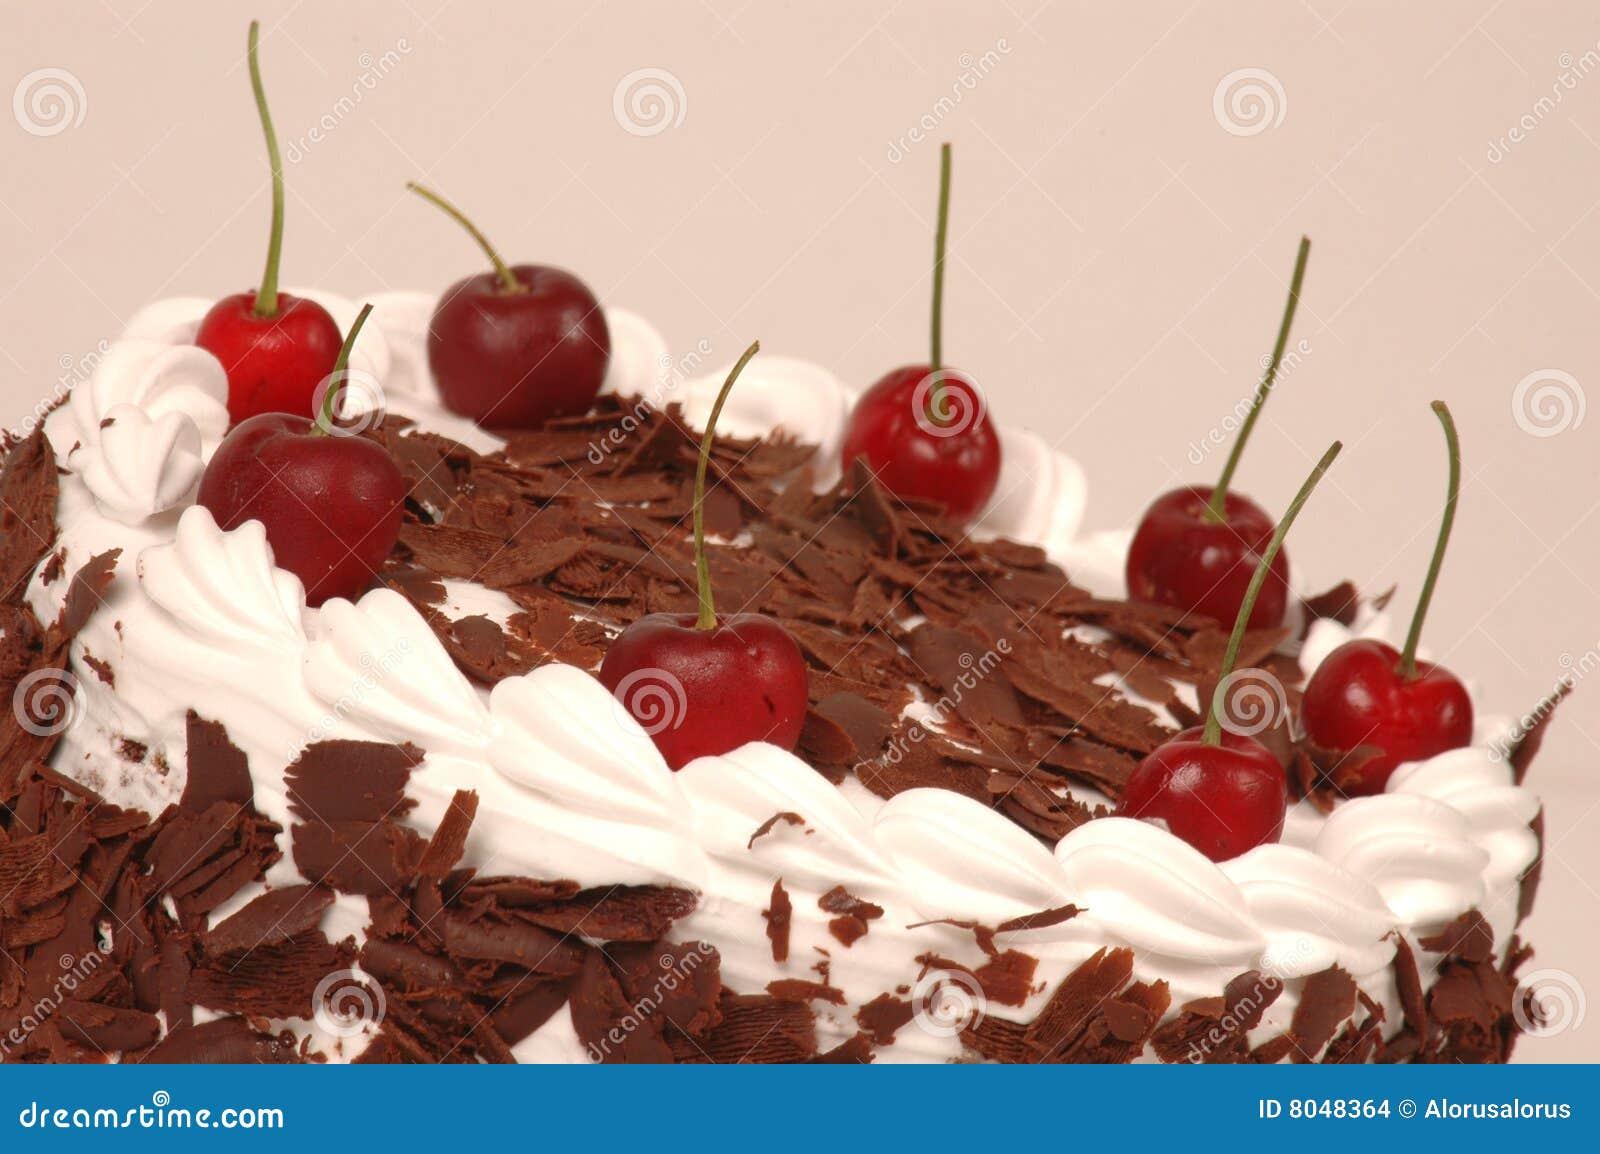 600x400 600 x 400 jpeg 129 kb embelsira receta receta per torte cake ...